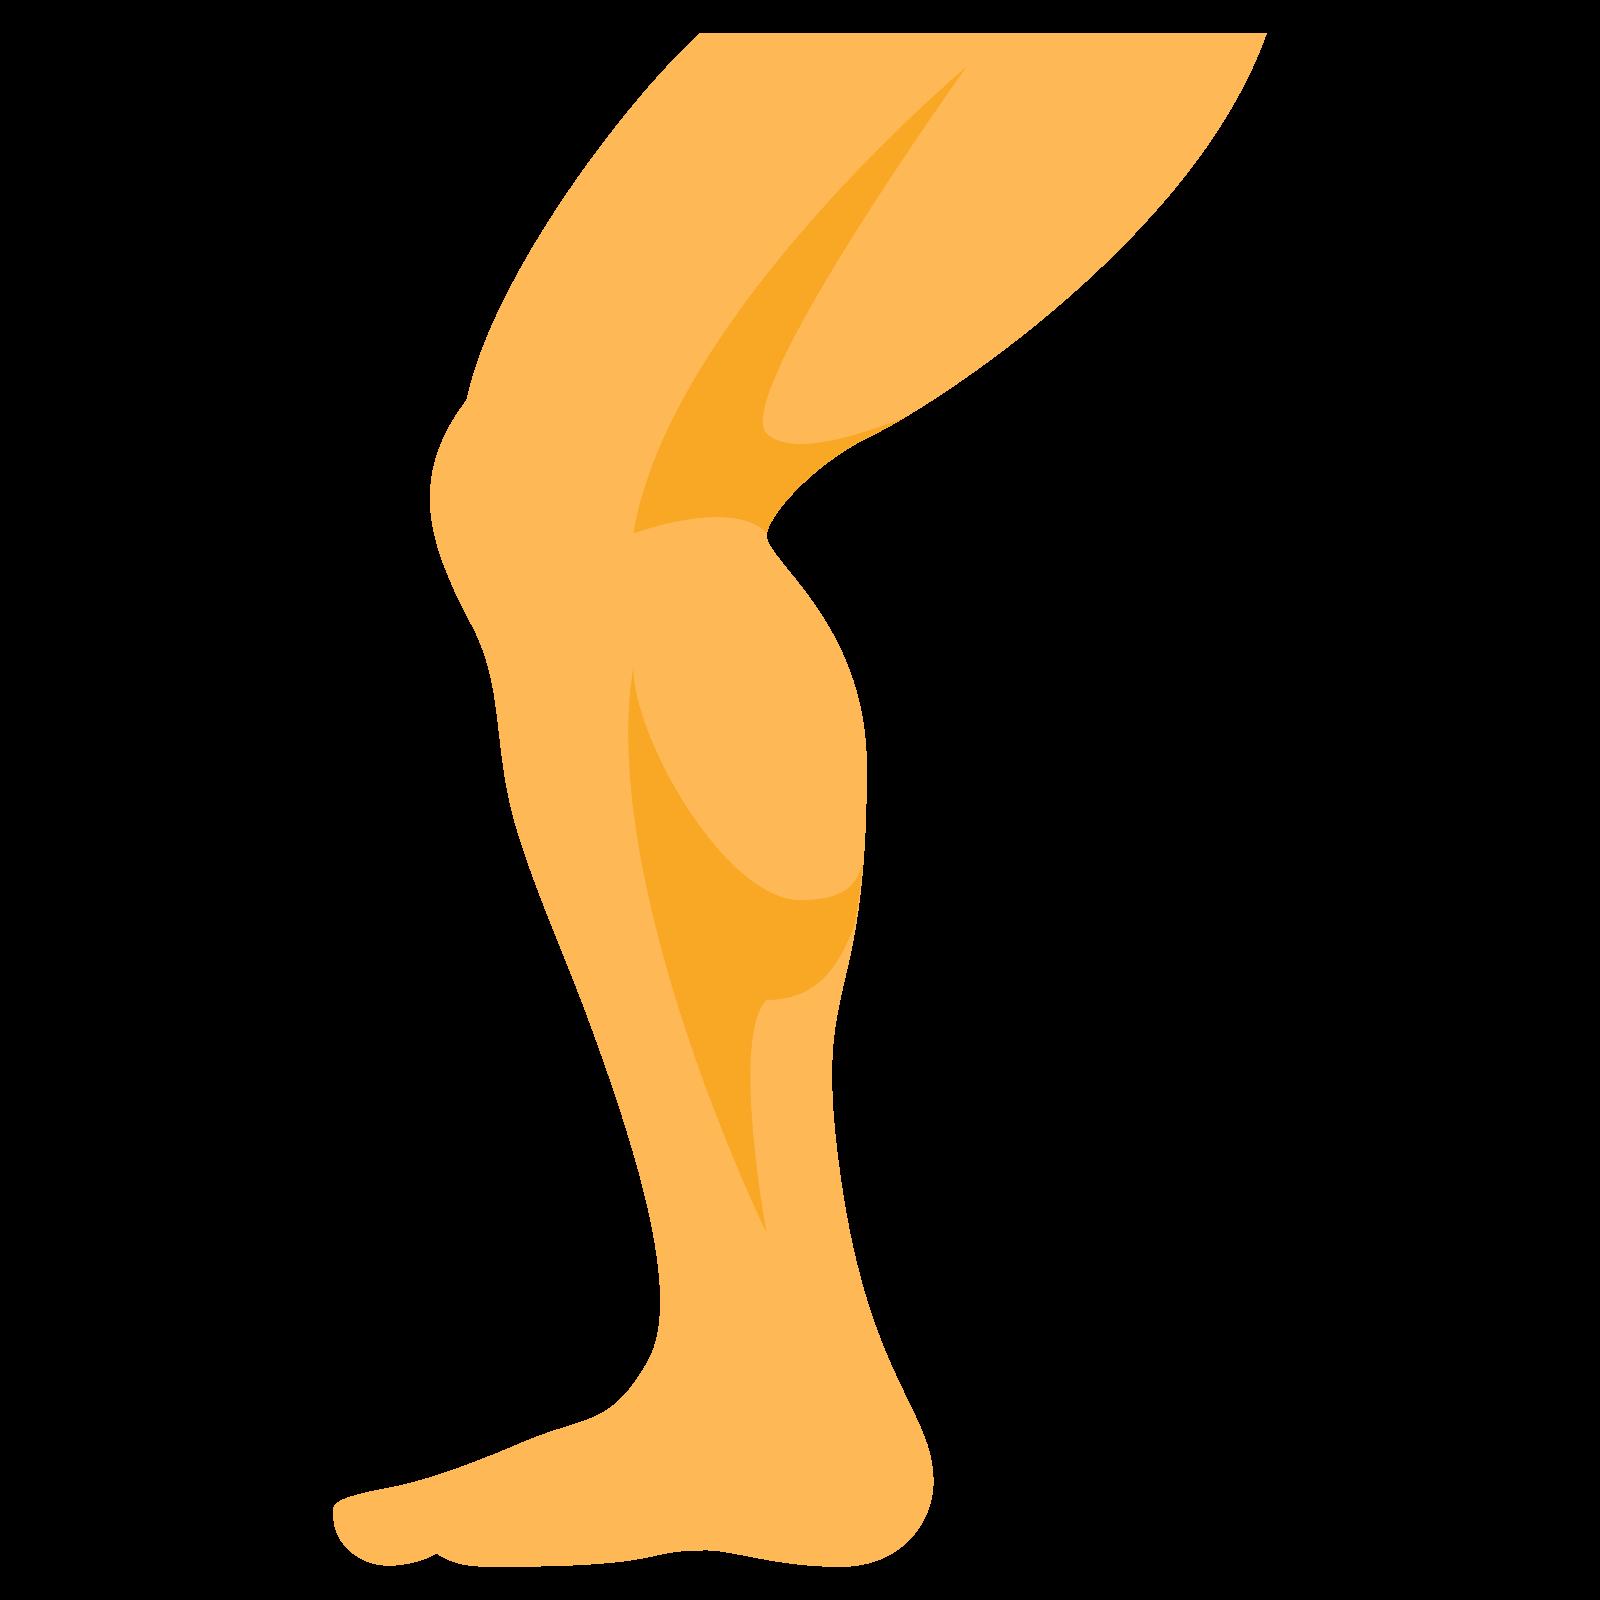 Icona leg download gratuito. Knee clipart bend knee